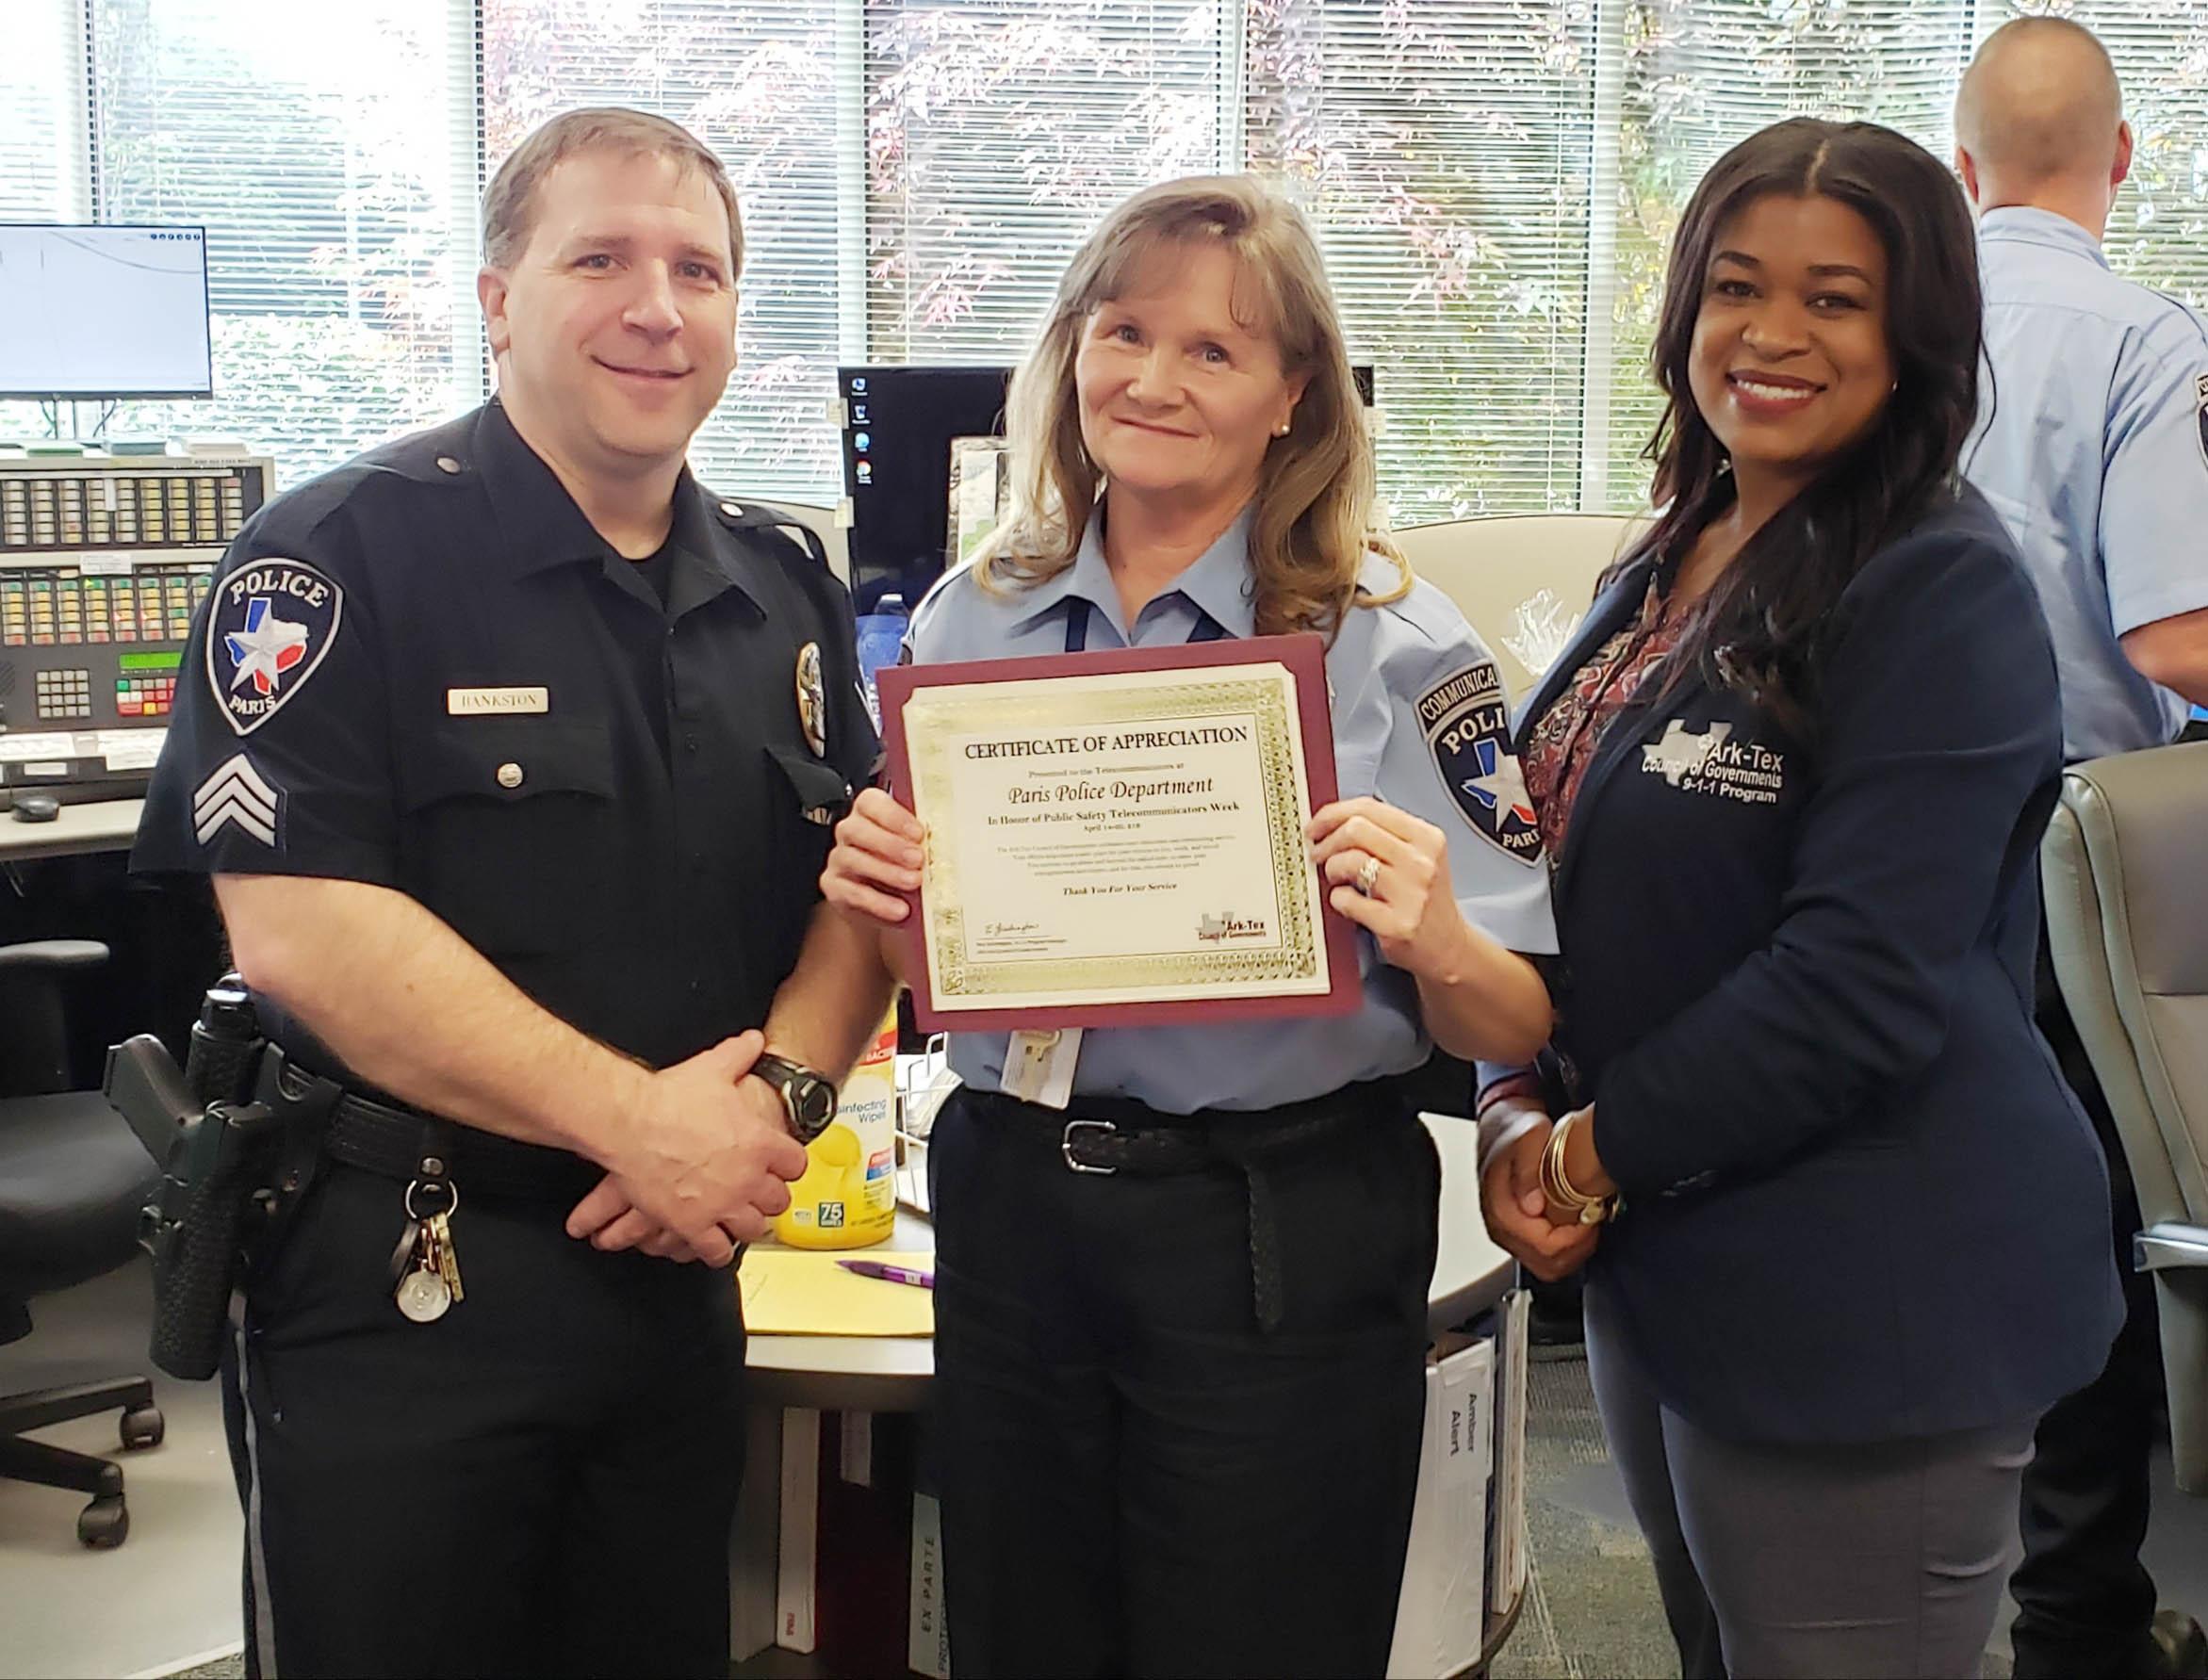 Sgt. Michael Bankston, Kathy Boaz and Rea Washington